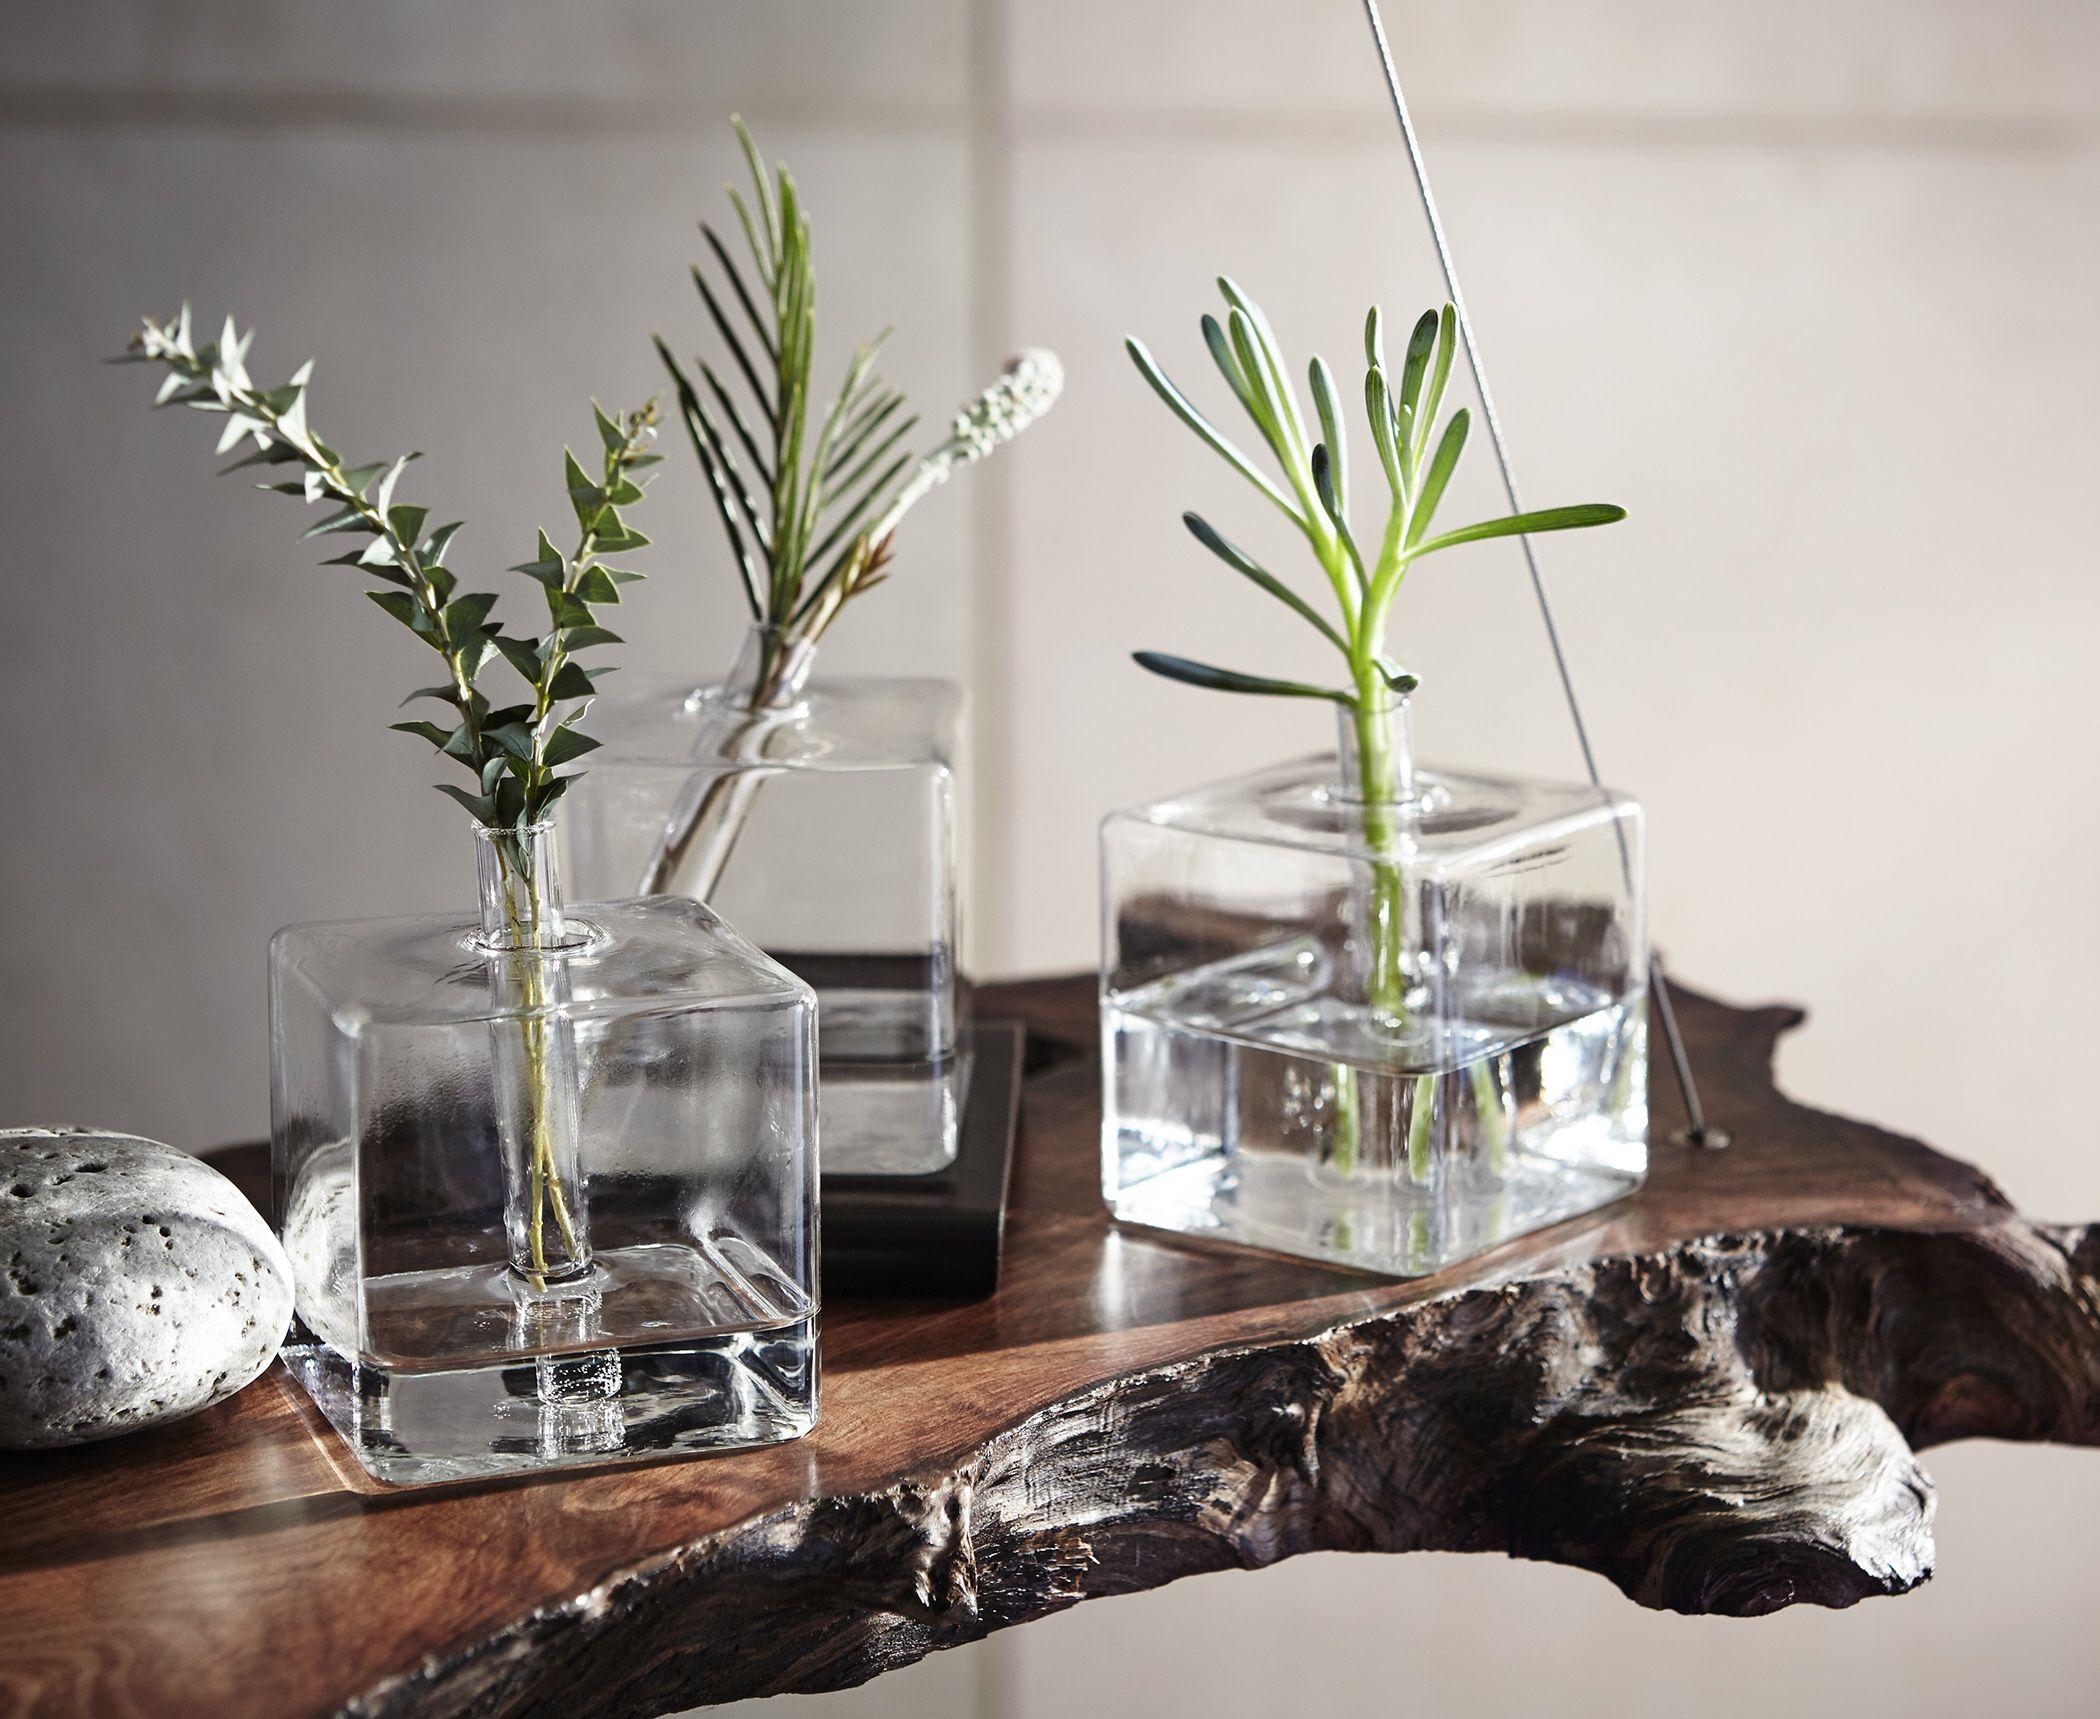 silver pedestal spaces glass cup bg serene living vases vase decorative view decor mercury